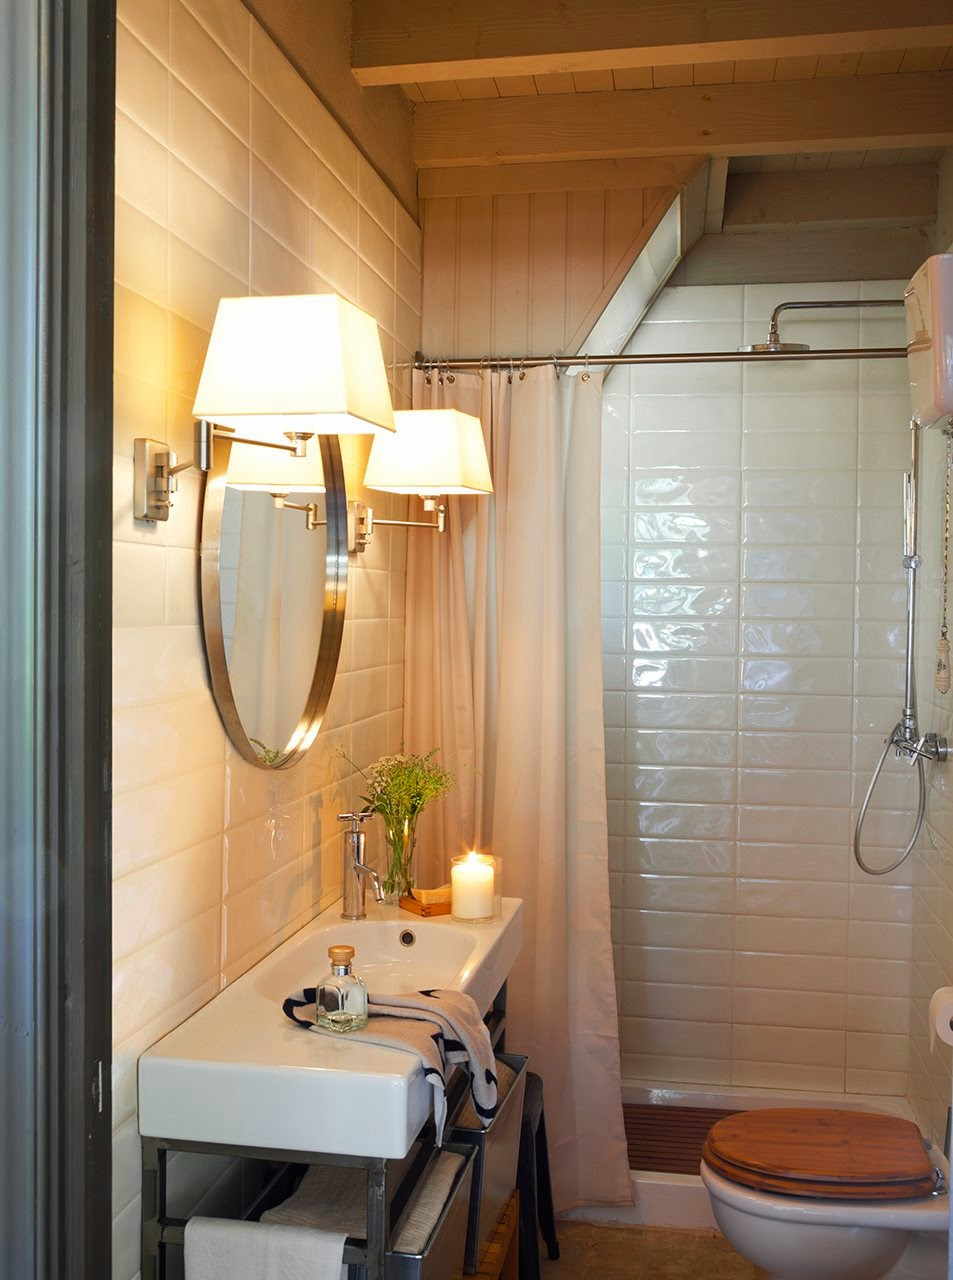 amenajari, interioare, decoratiuni, decor, design interior, stil rustic, reconversie, zid de piatra, baie,